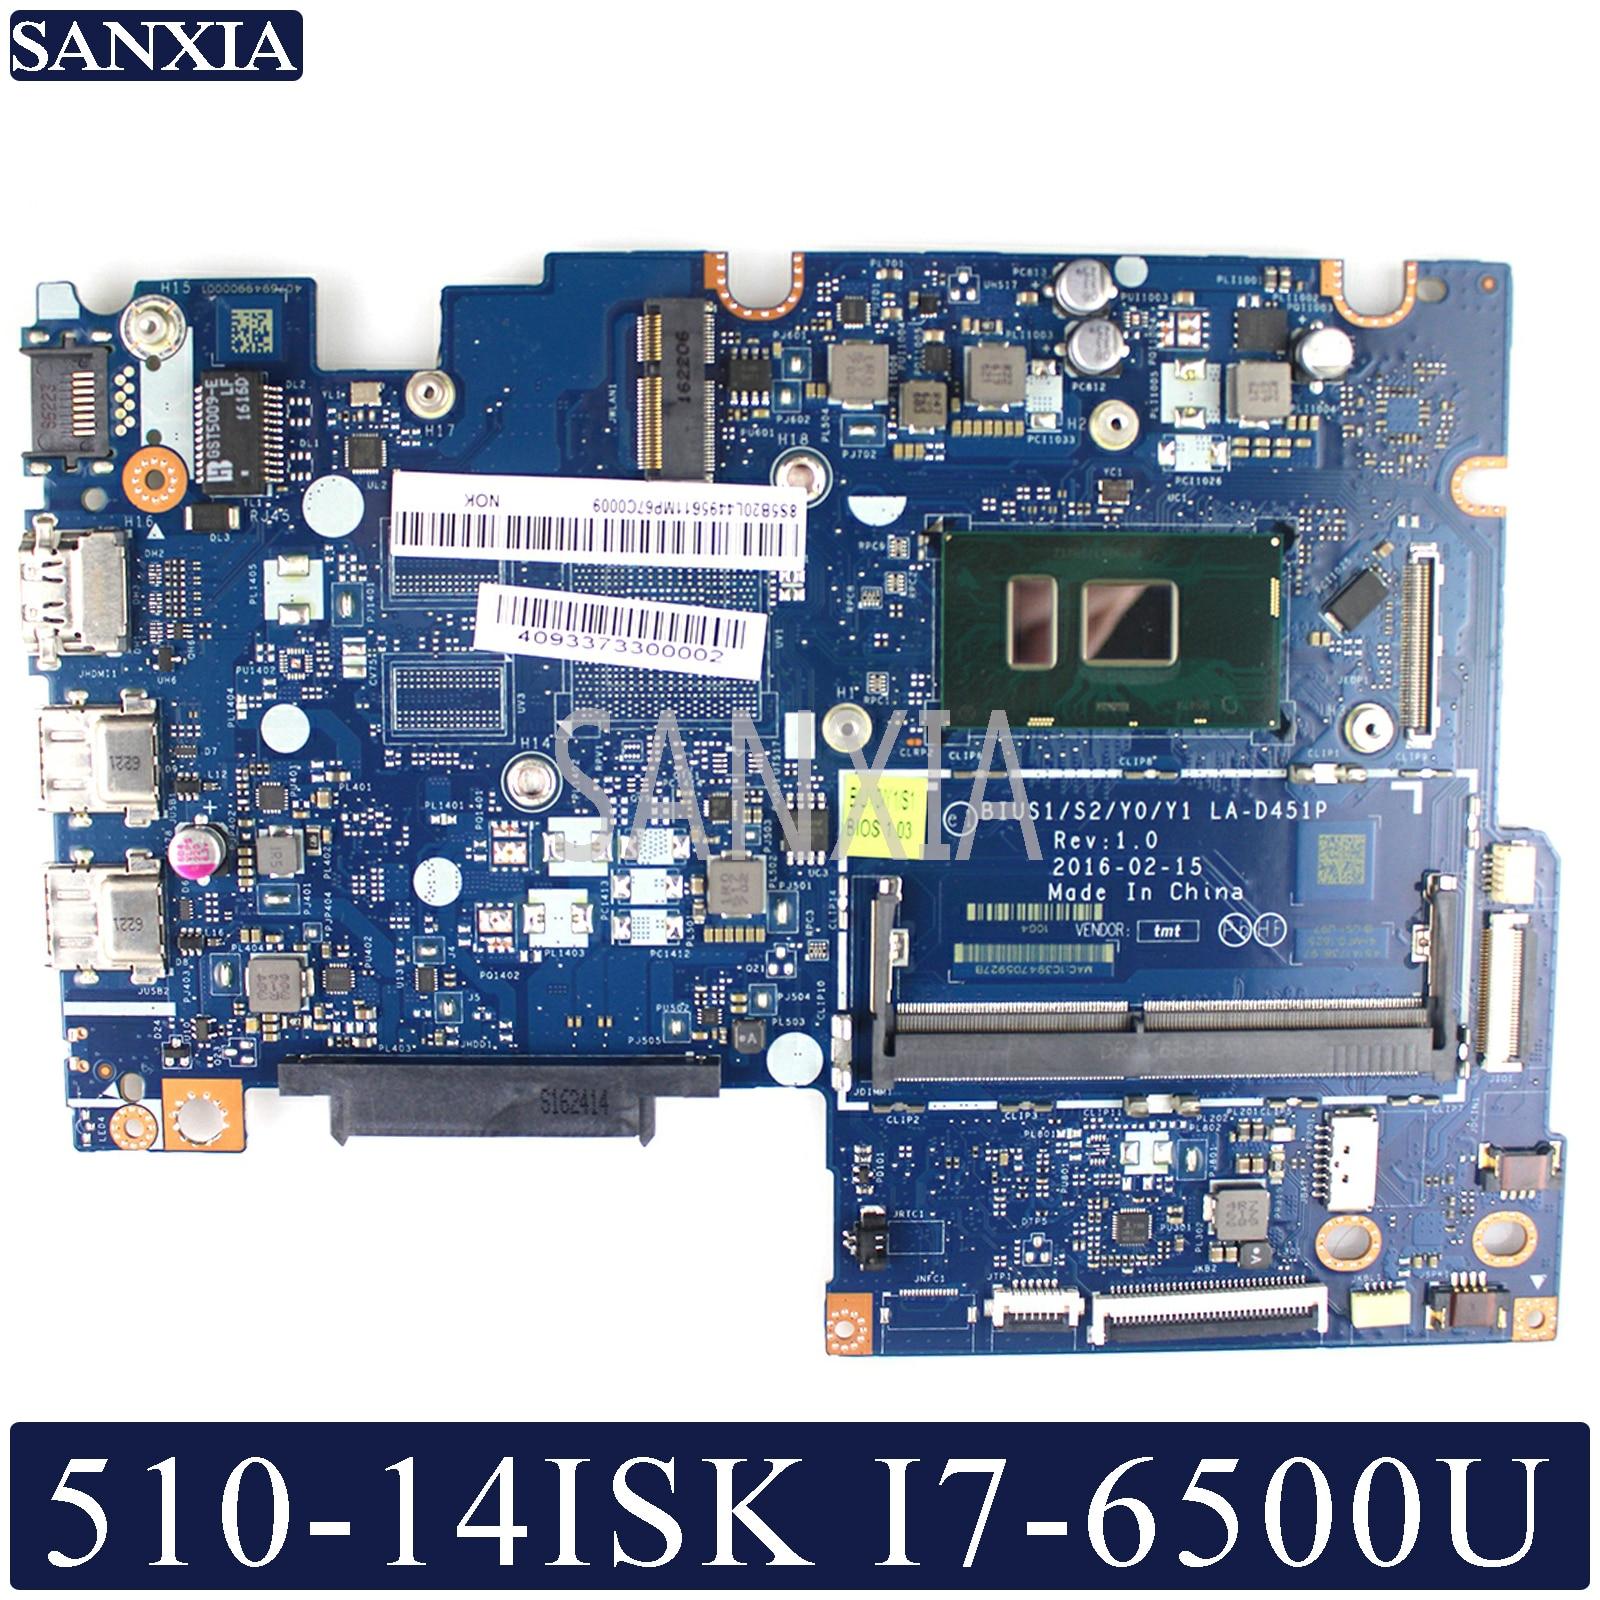 KEFU LA-D451P Laptop Motherboard For Lenovo YOGA 510-14ISK Flex4-1470 Original Mainboard I7-6500U